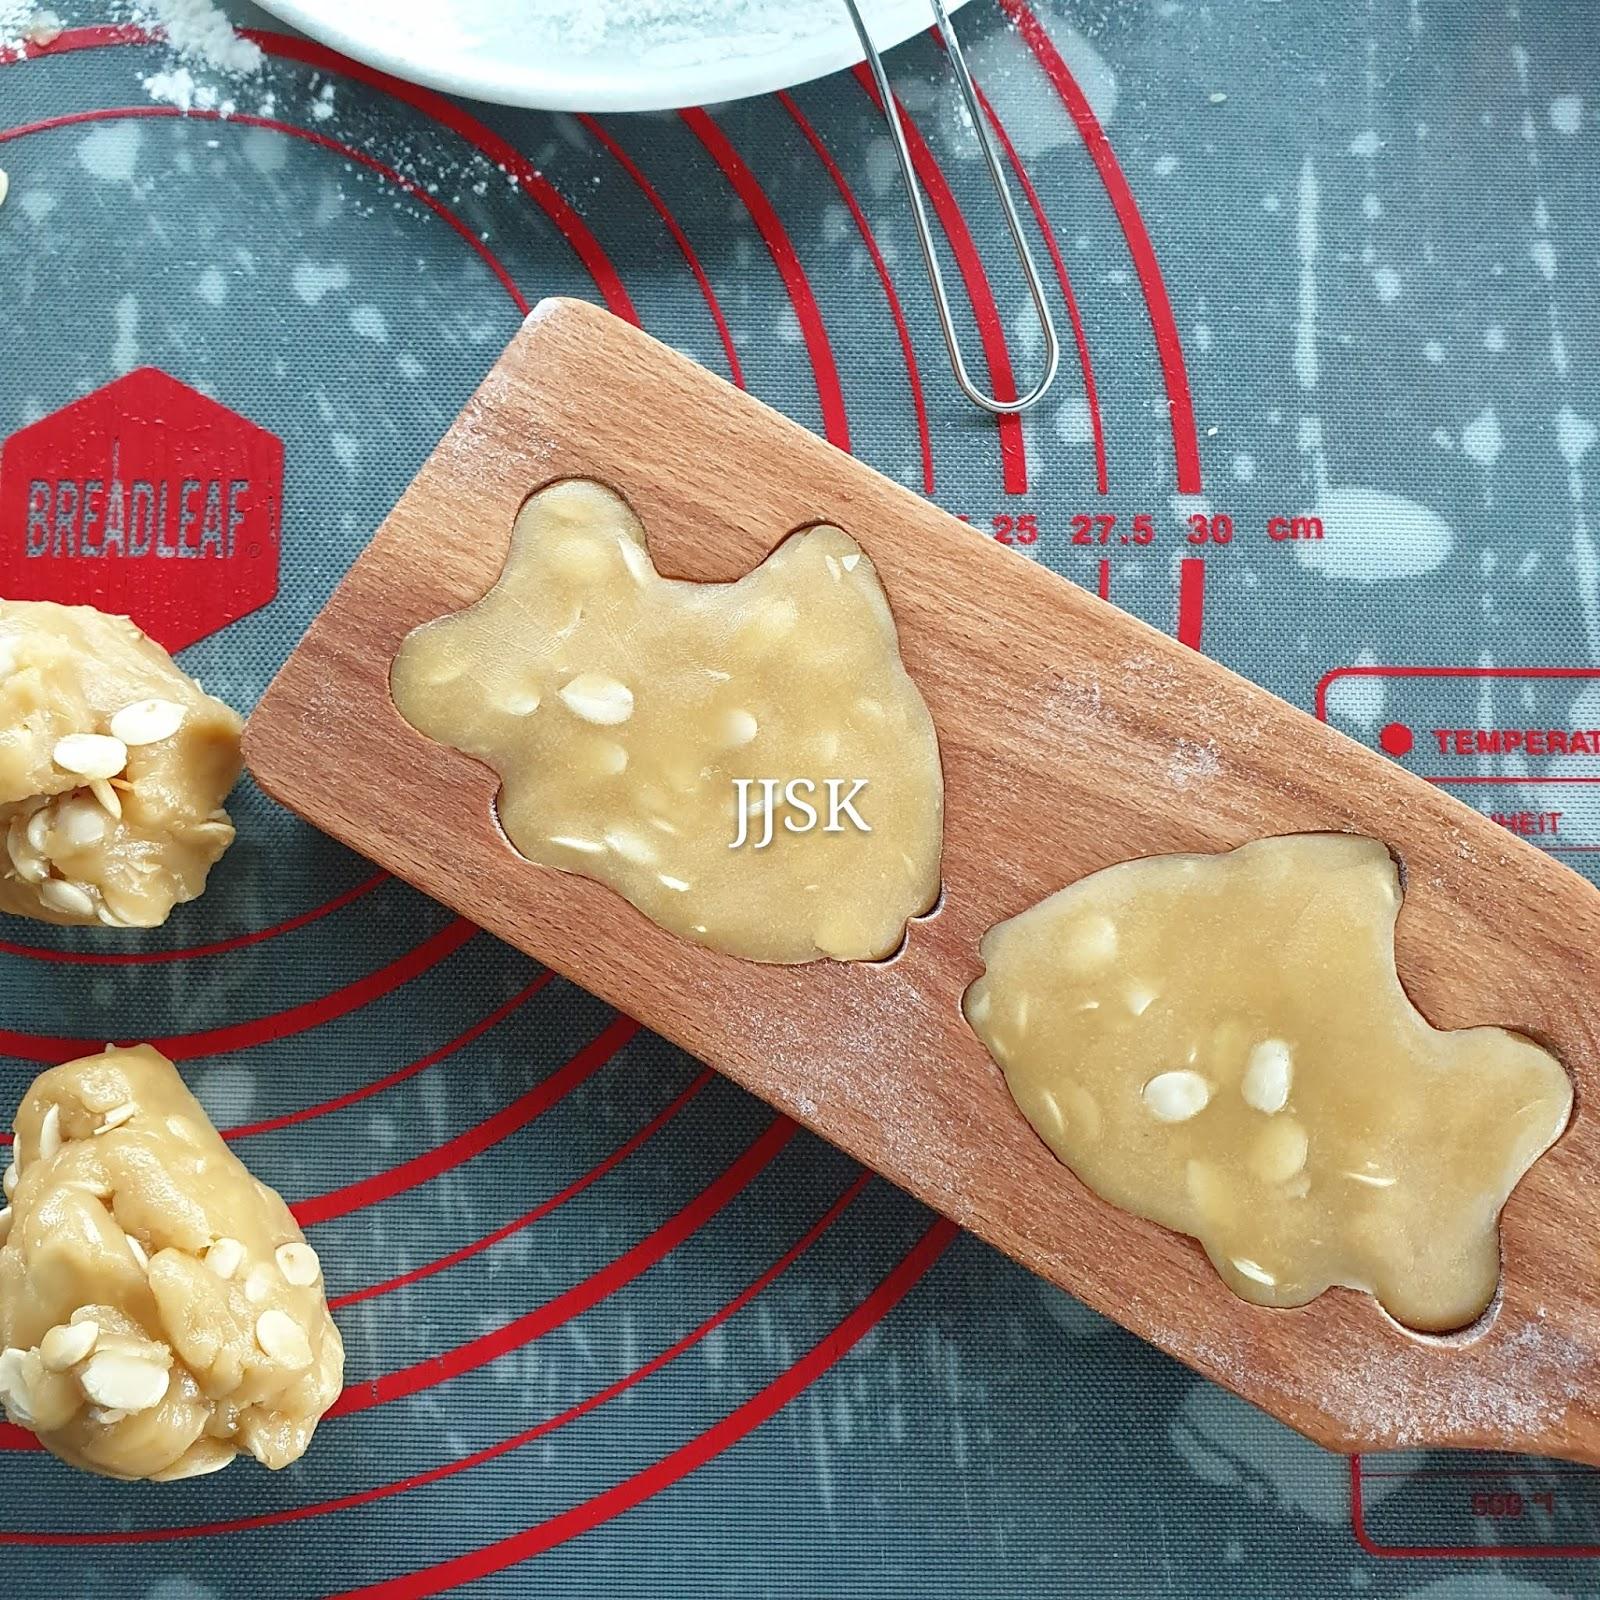 Wood Mode Kitchens Lowes Kitchen Cart 爱厨房的幸福之味: 白瓜子公仔饼